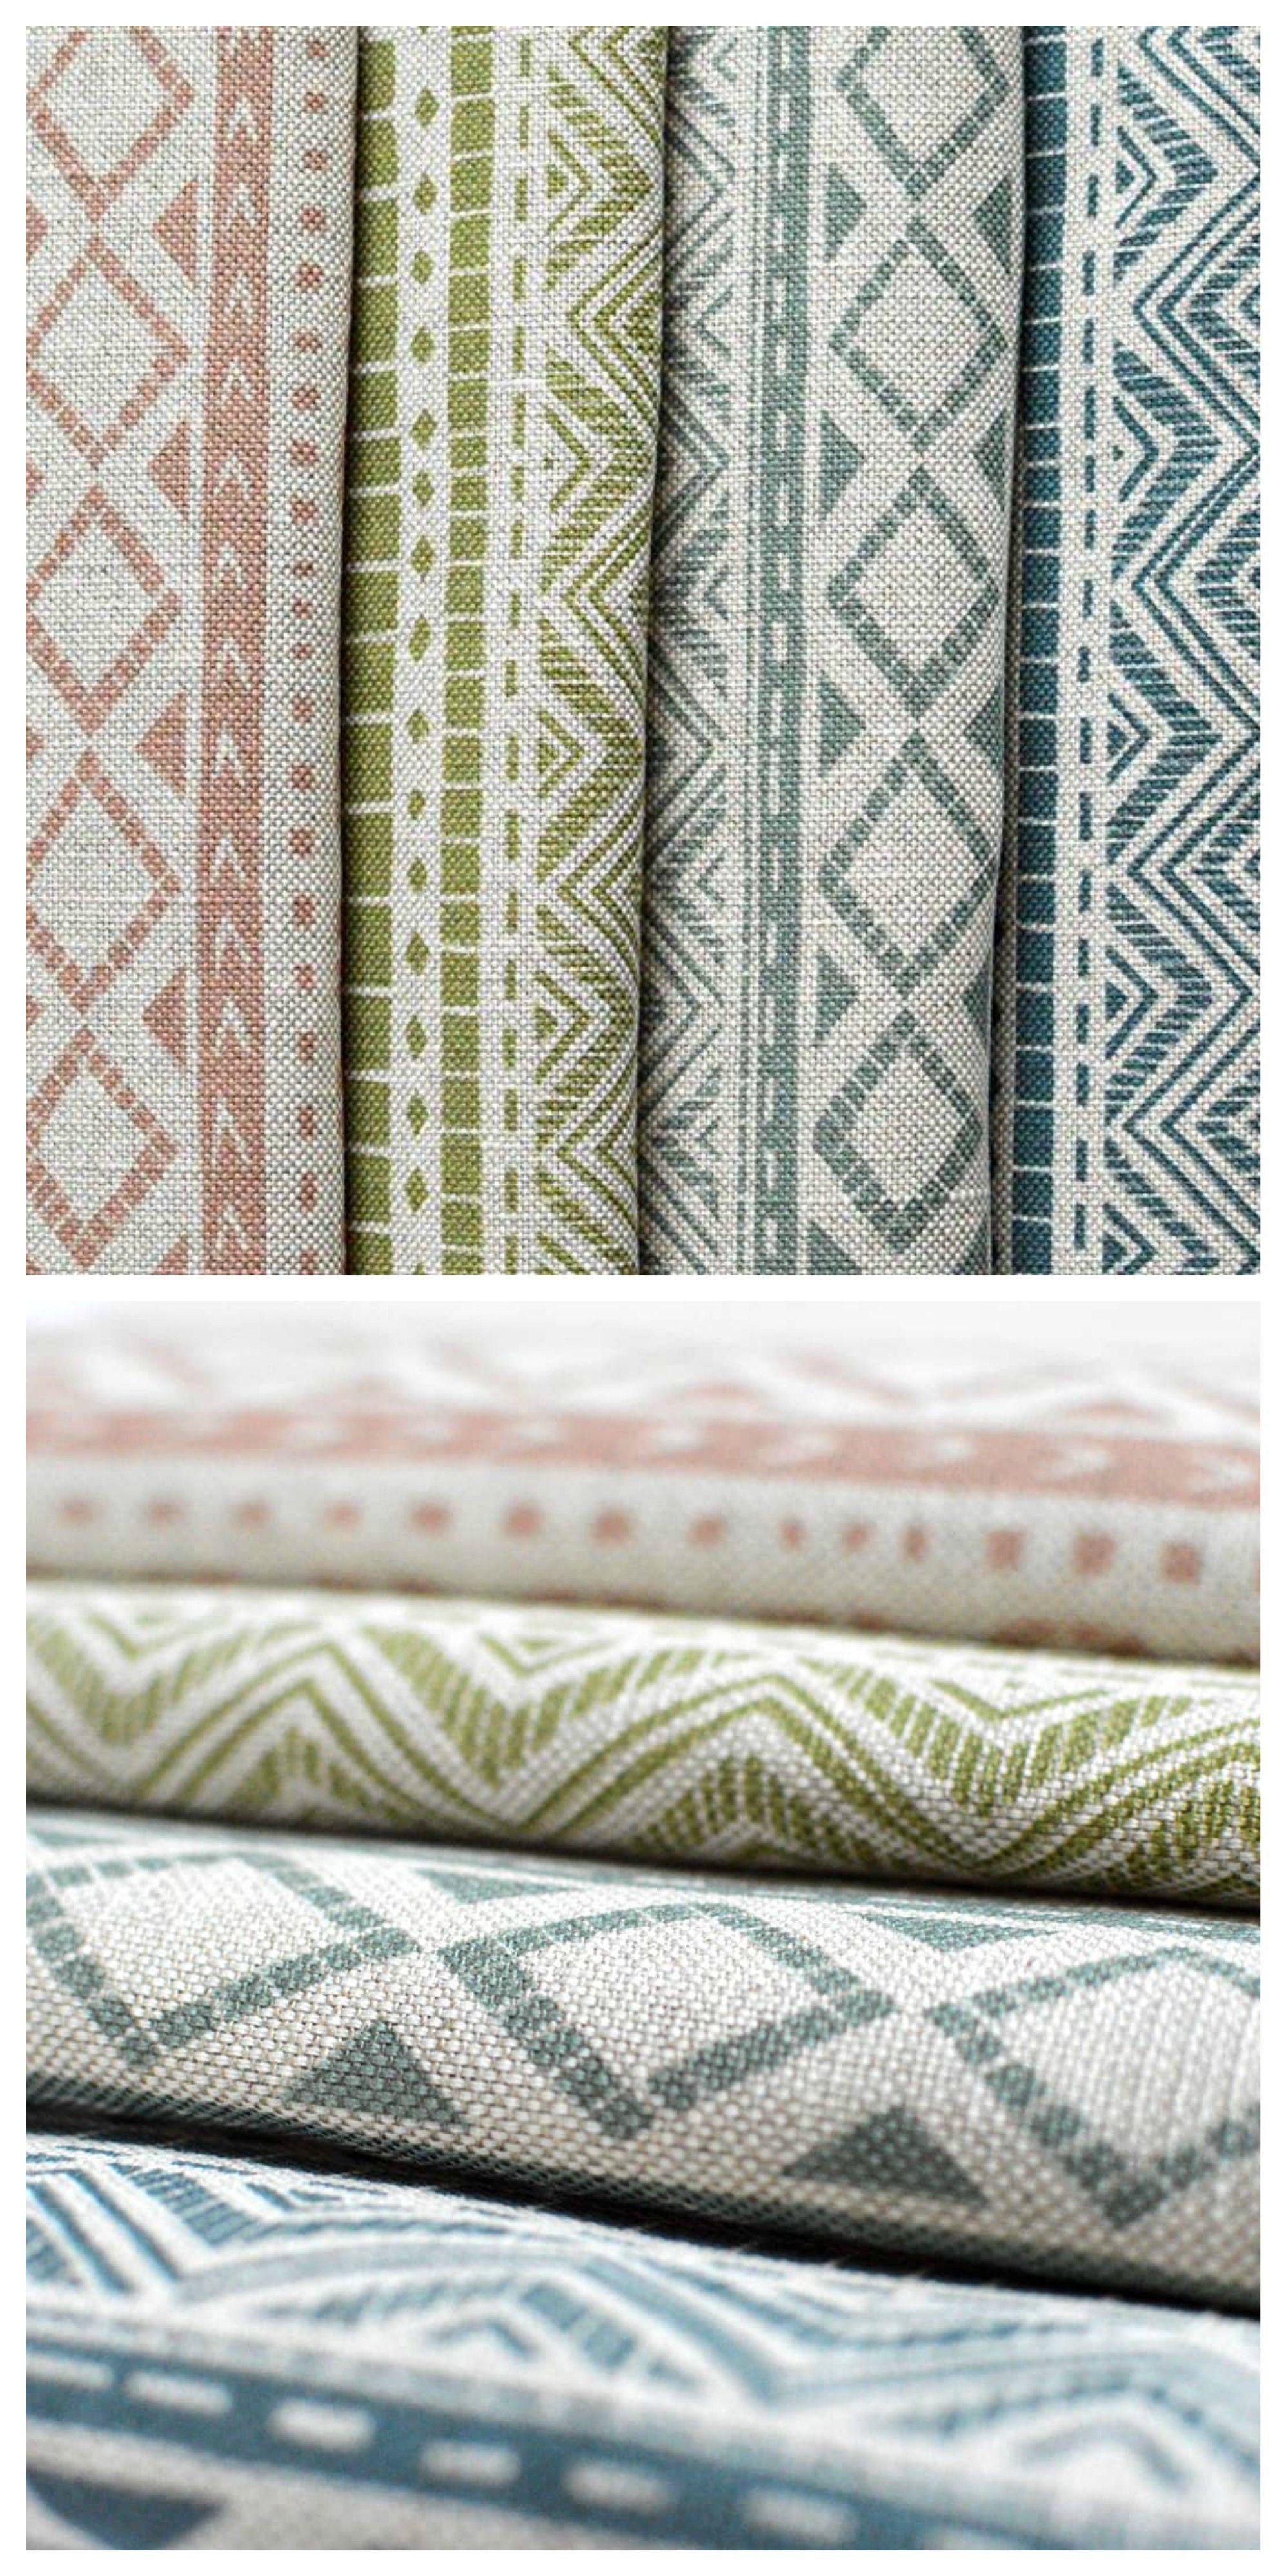 Sofa Fabric Suppliers In Mumbai Wooden Furniture Set Curtain Material India Menzilperde Net